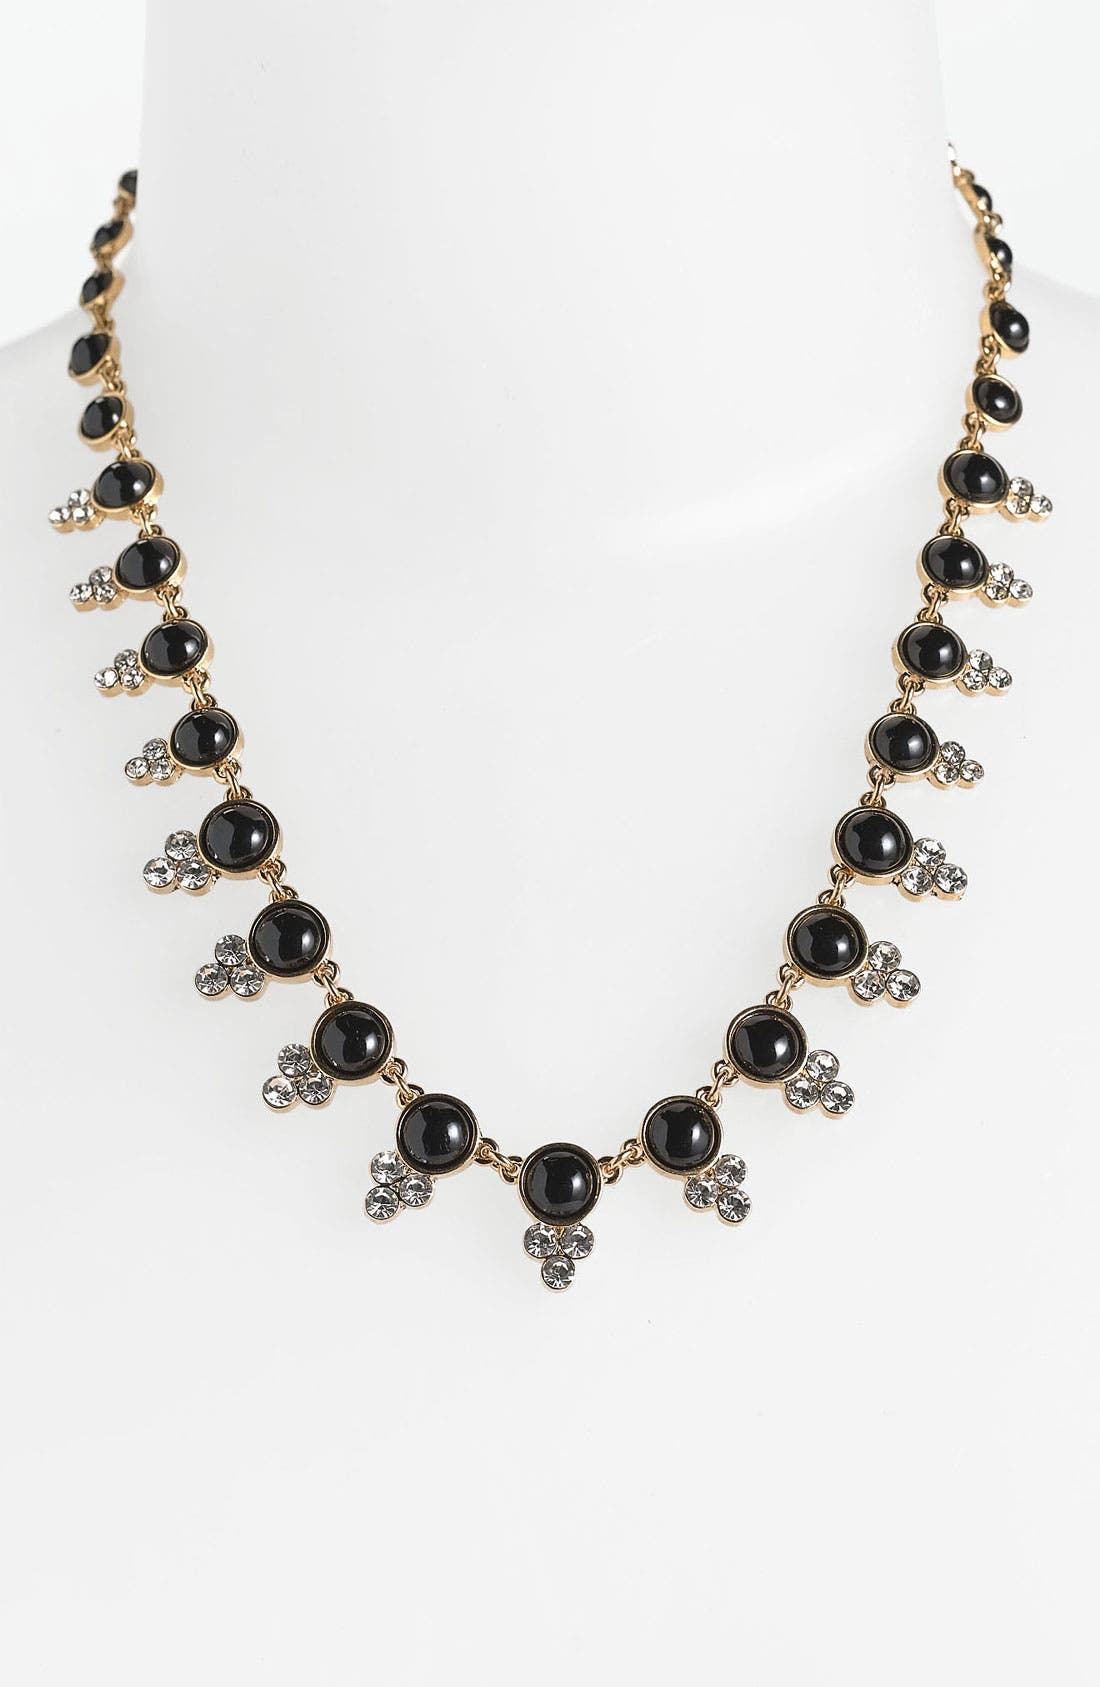 ANNE KLEIN Collar Necklace, Main, color, 001